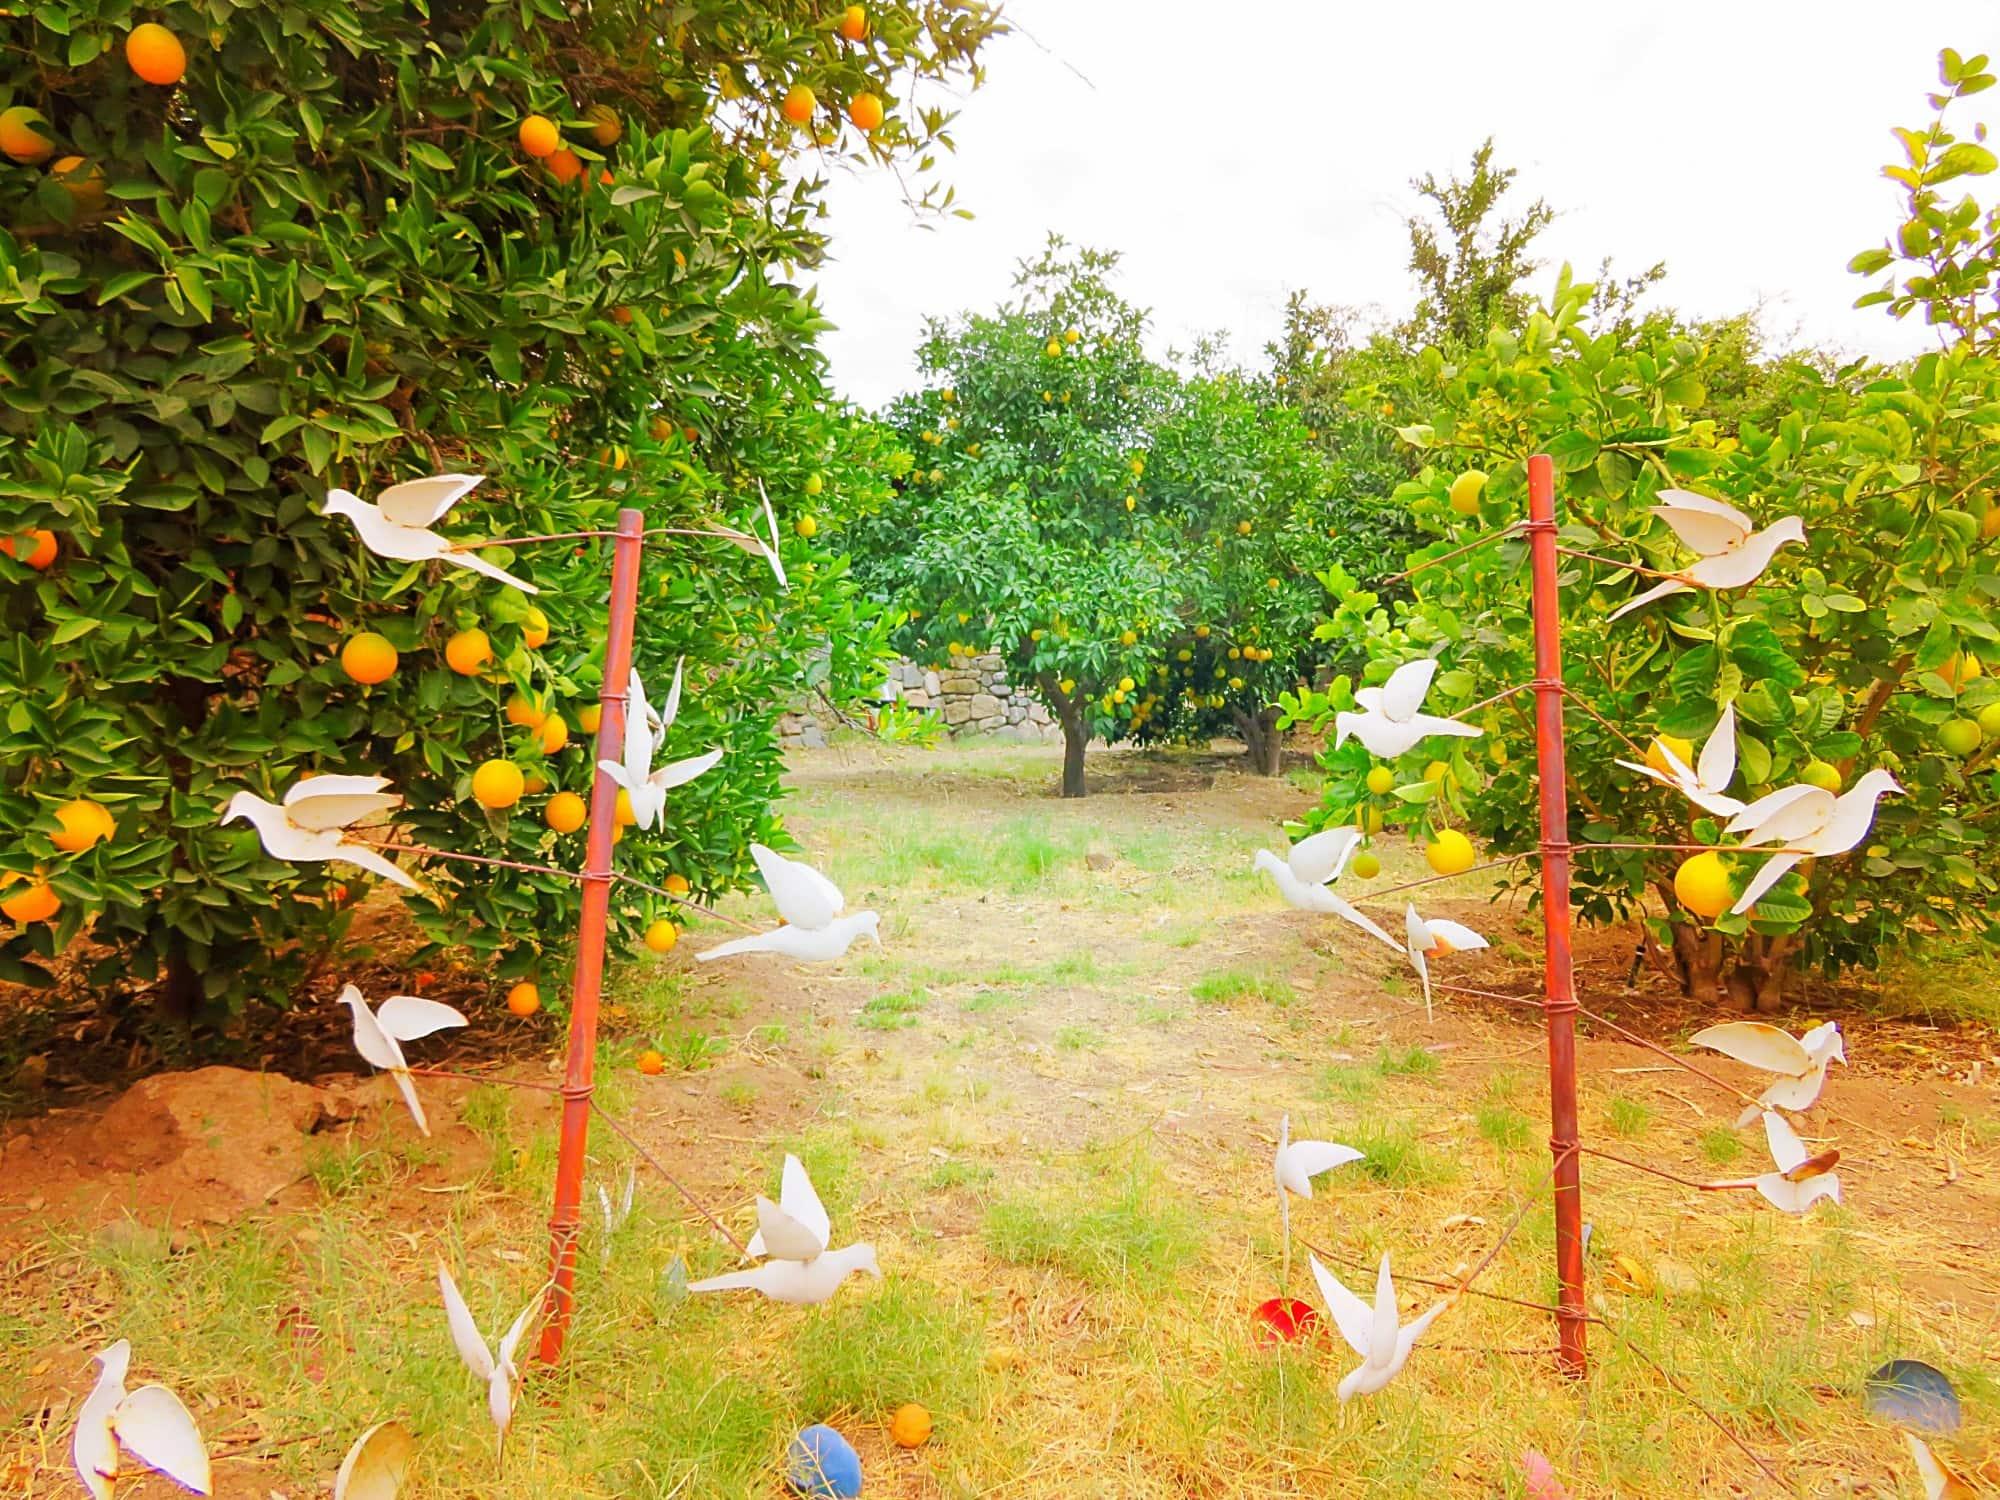 A dove art installation among citrus trees at Aravaipa Farms Inn